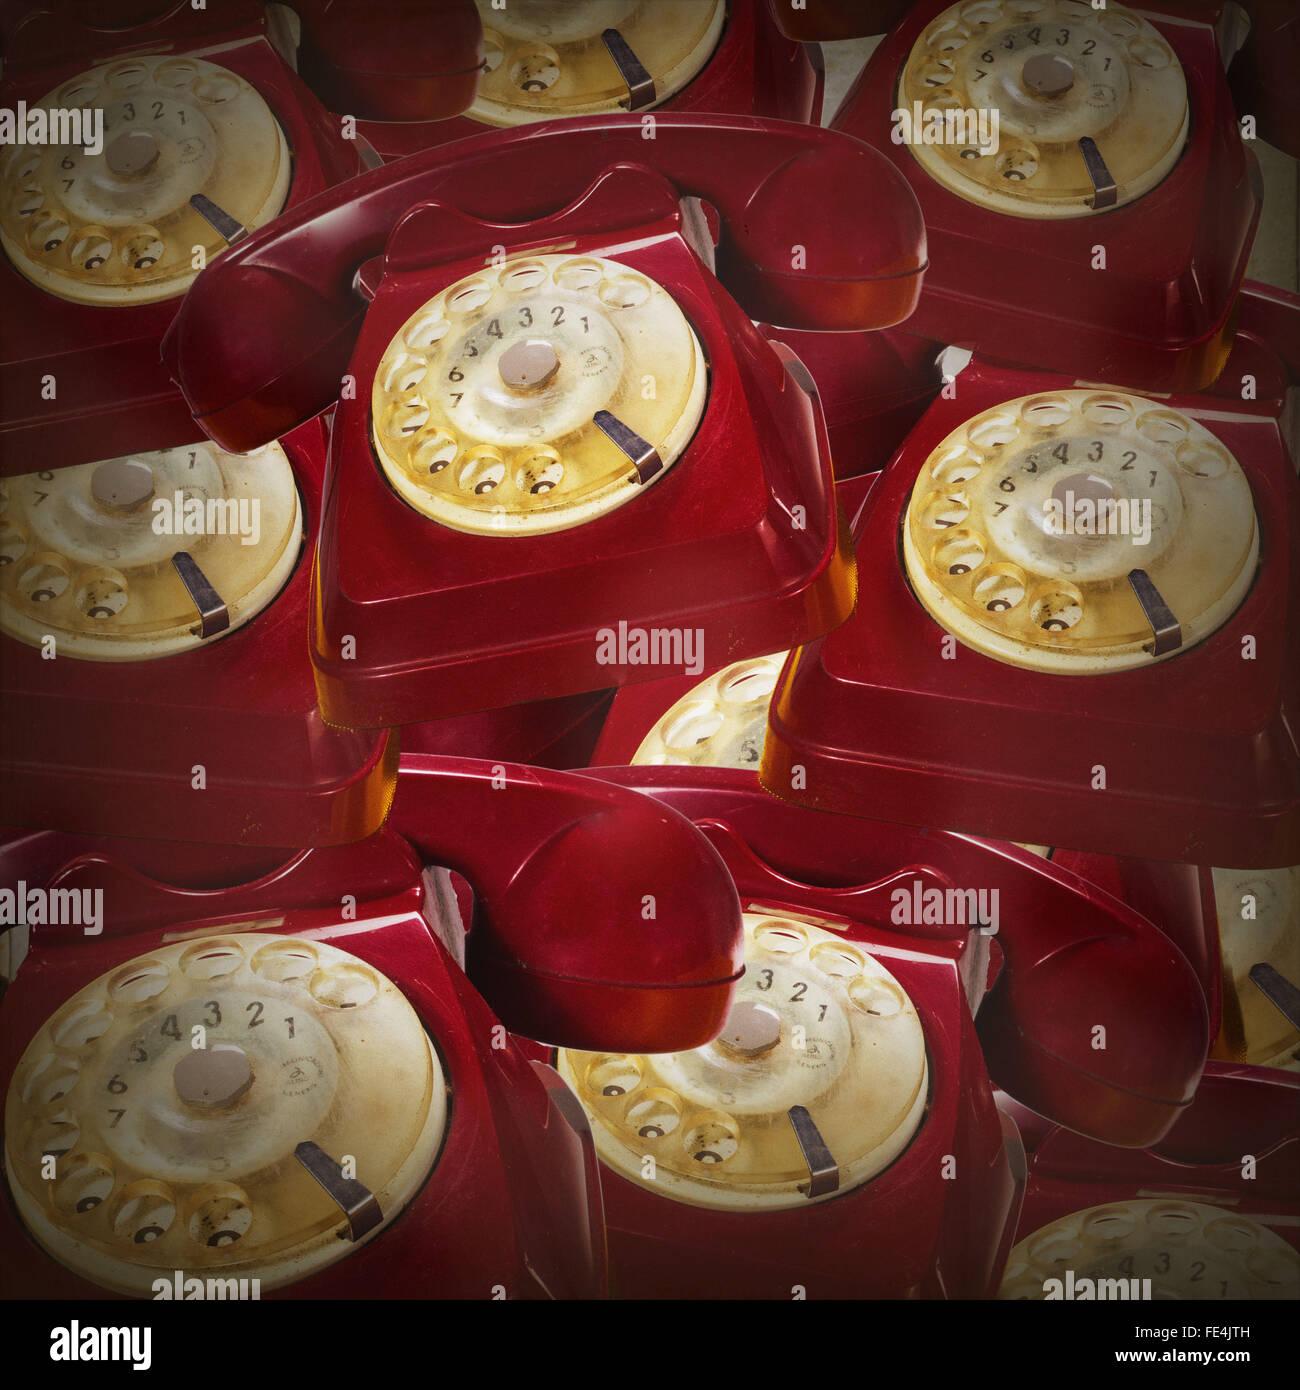 Disparo de fotograma completo de Rojo teléfonos giratorios Foto de stock